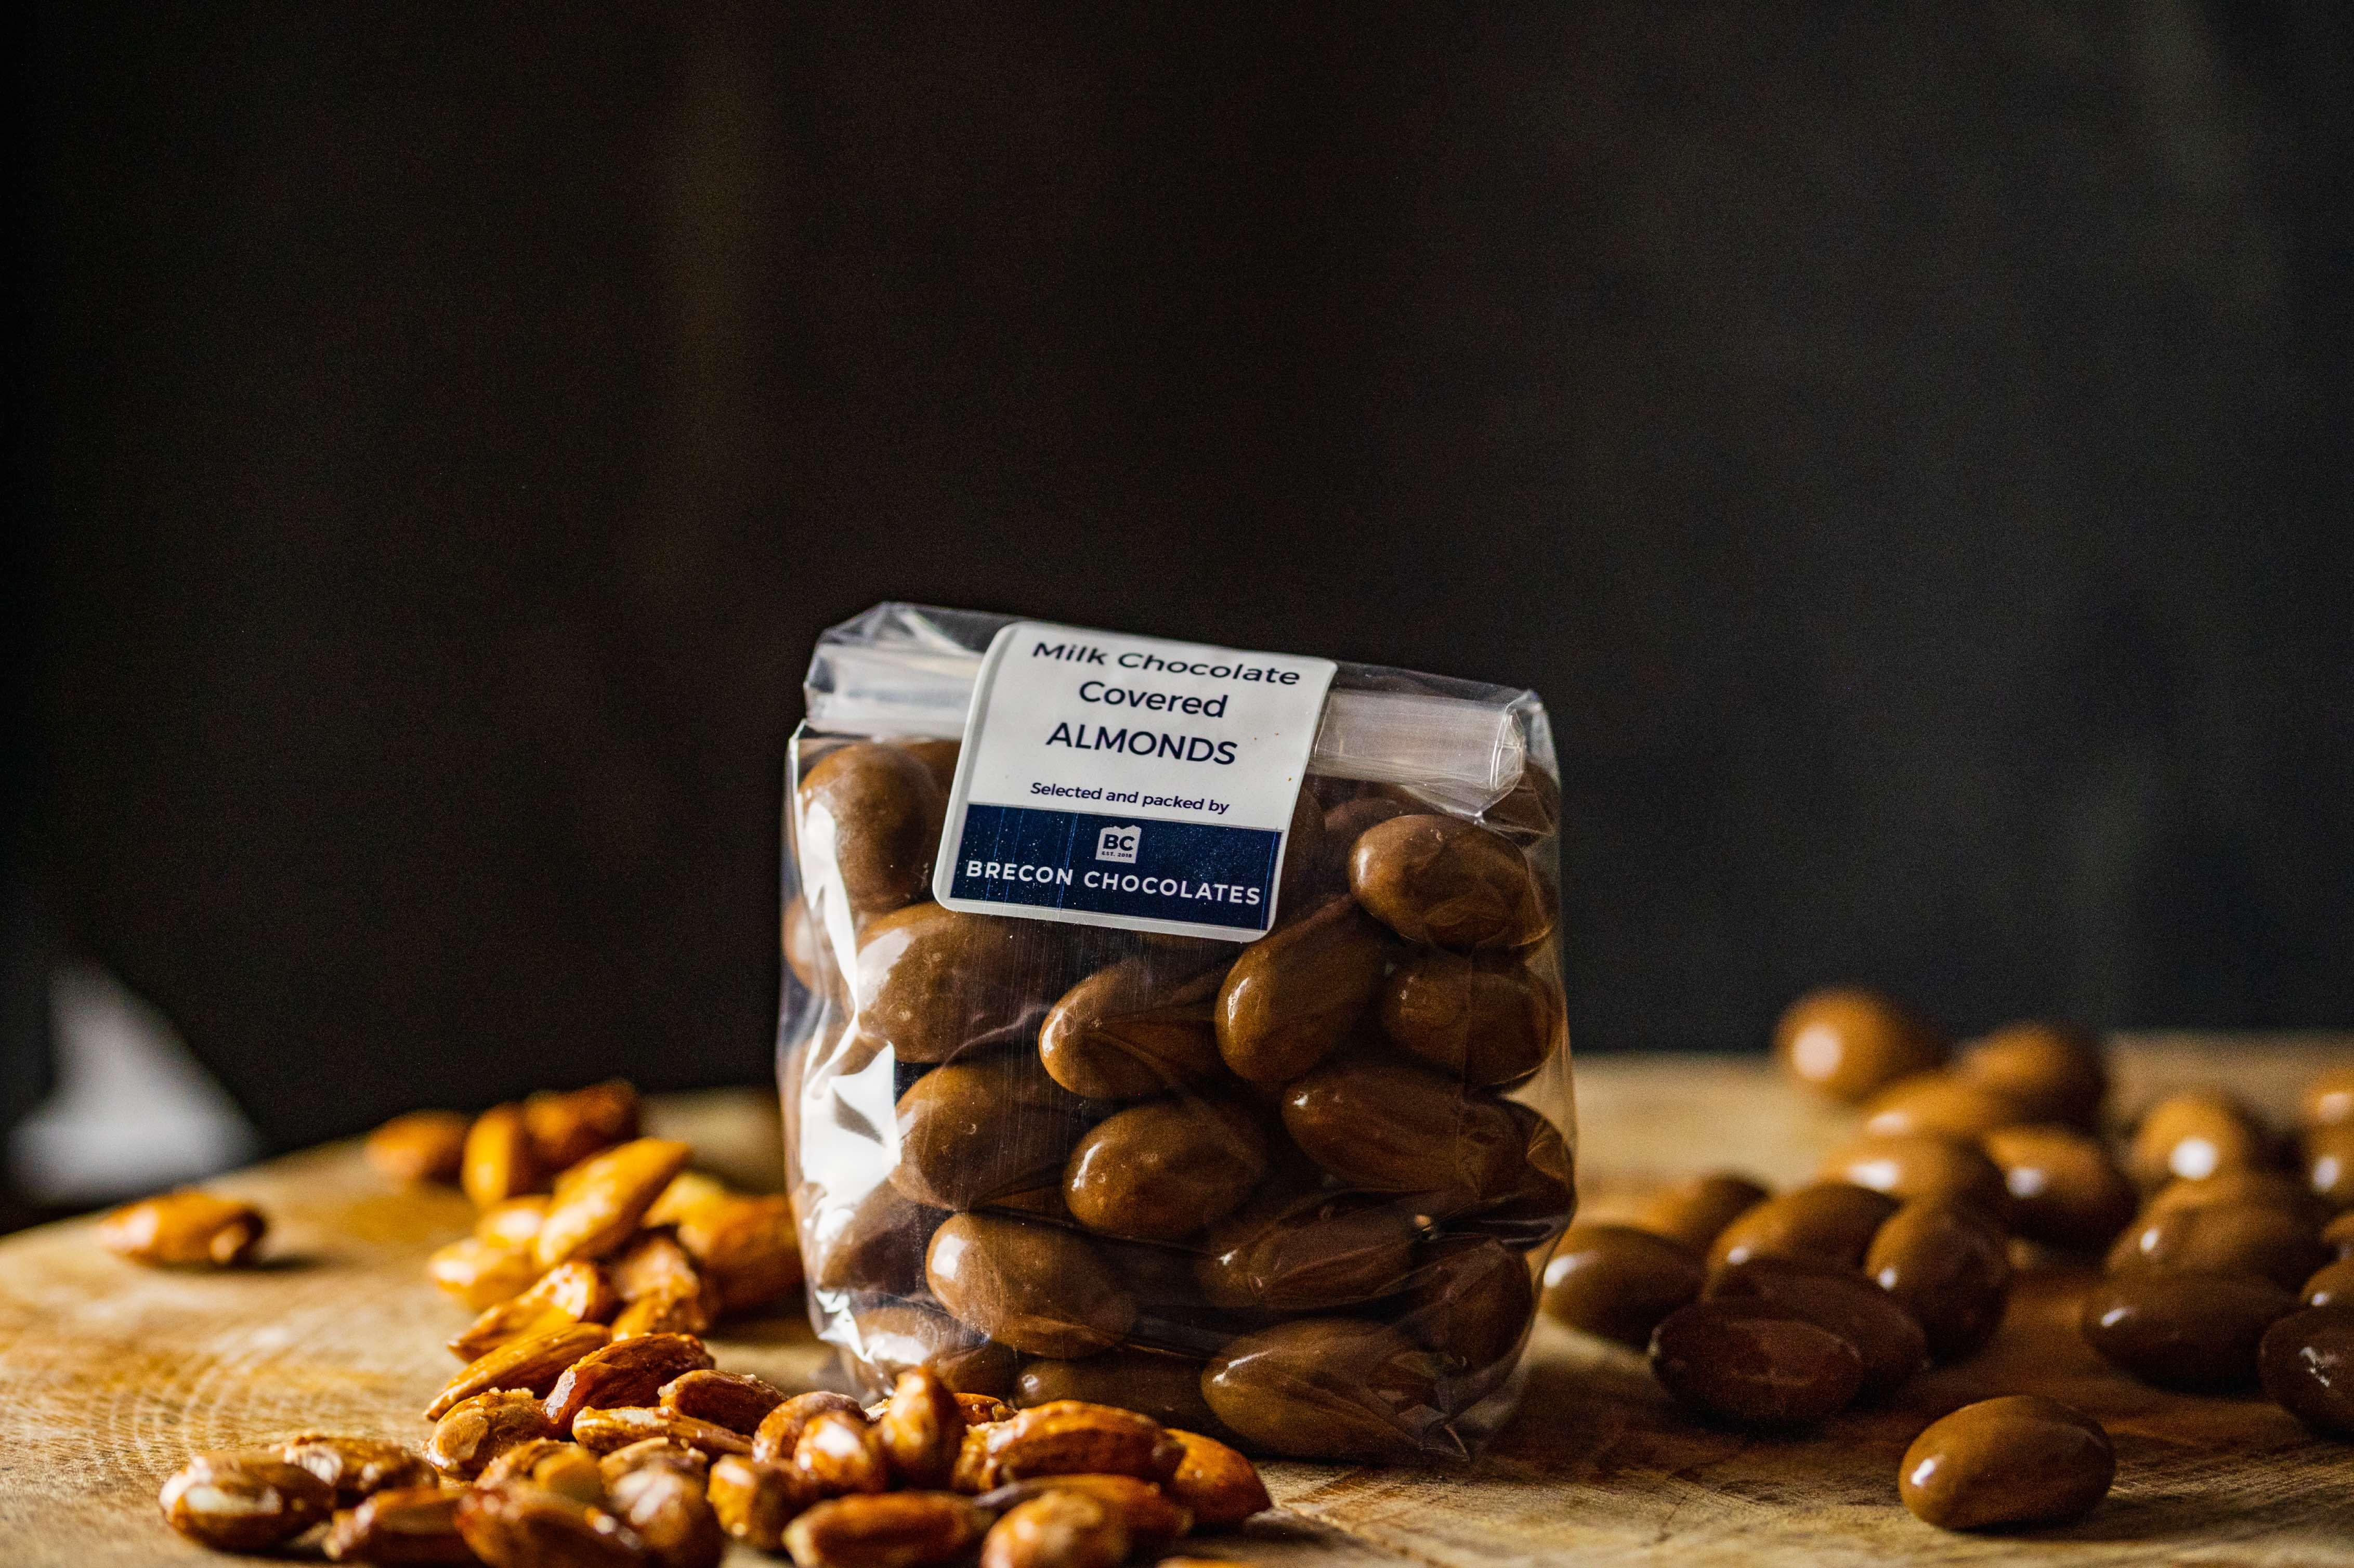 Milk Chocolate Covered Almonds.